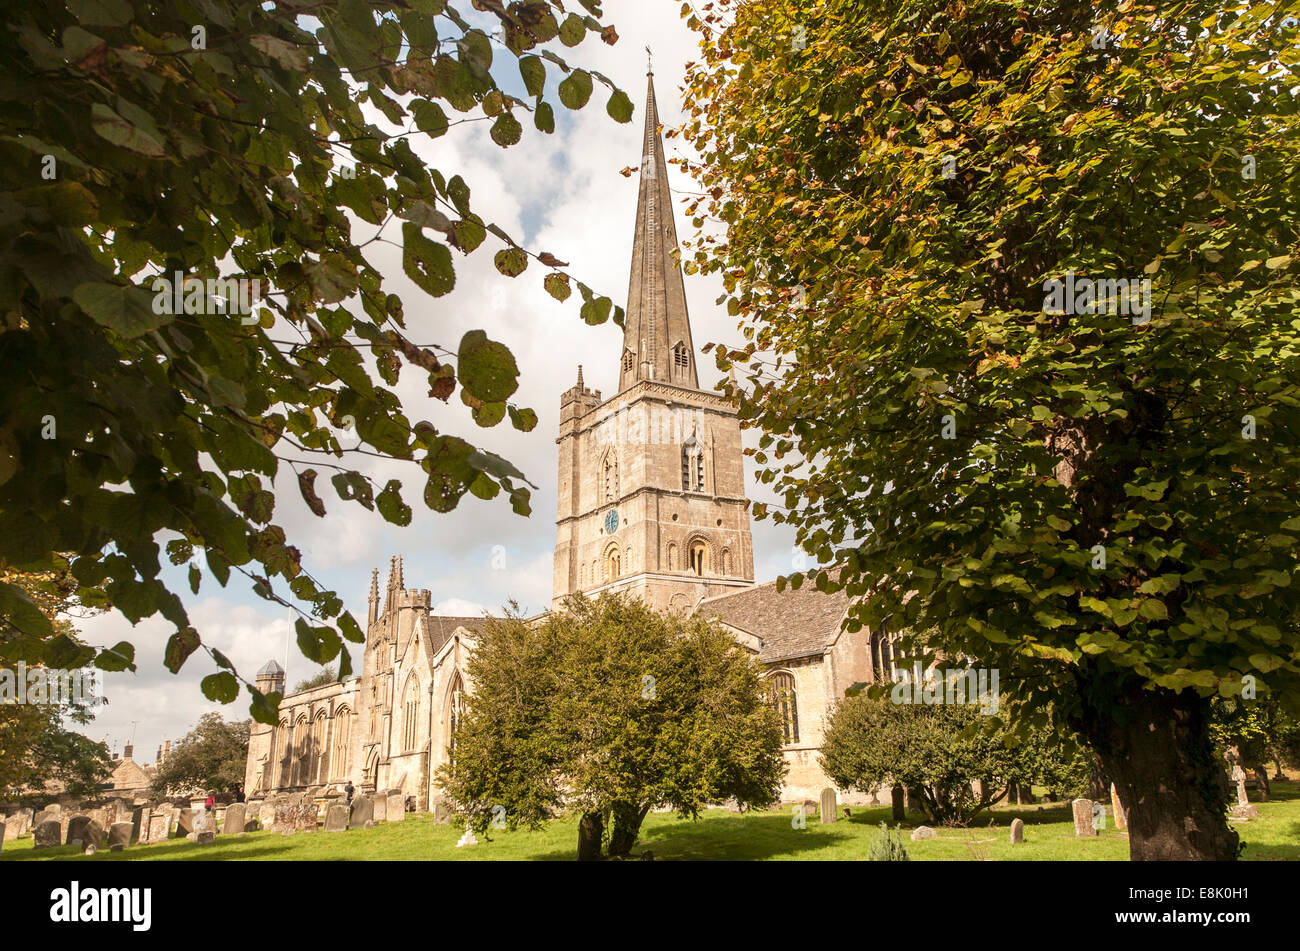 St John the Baptist church with spire, Burford, Oxfordshire, England, UK - Stock Image